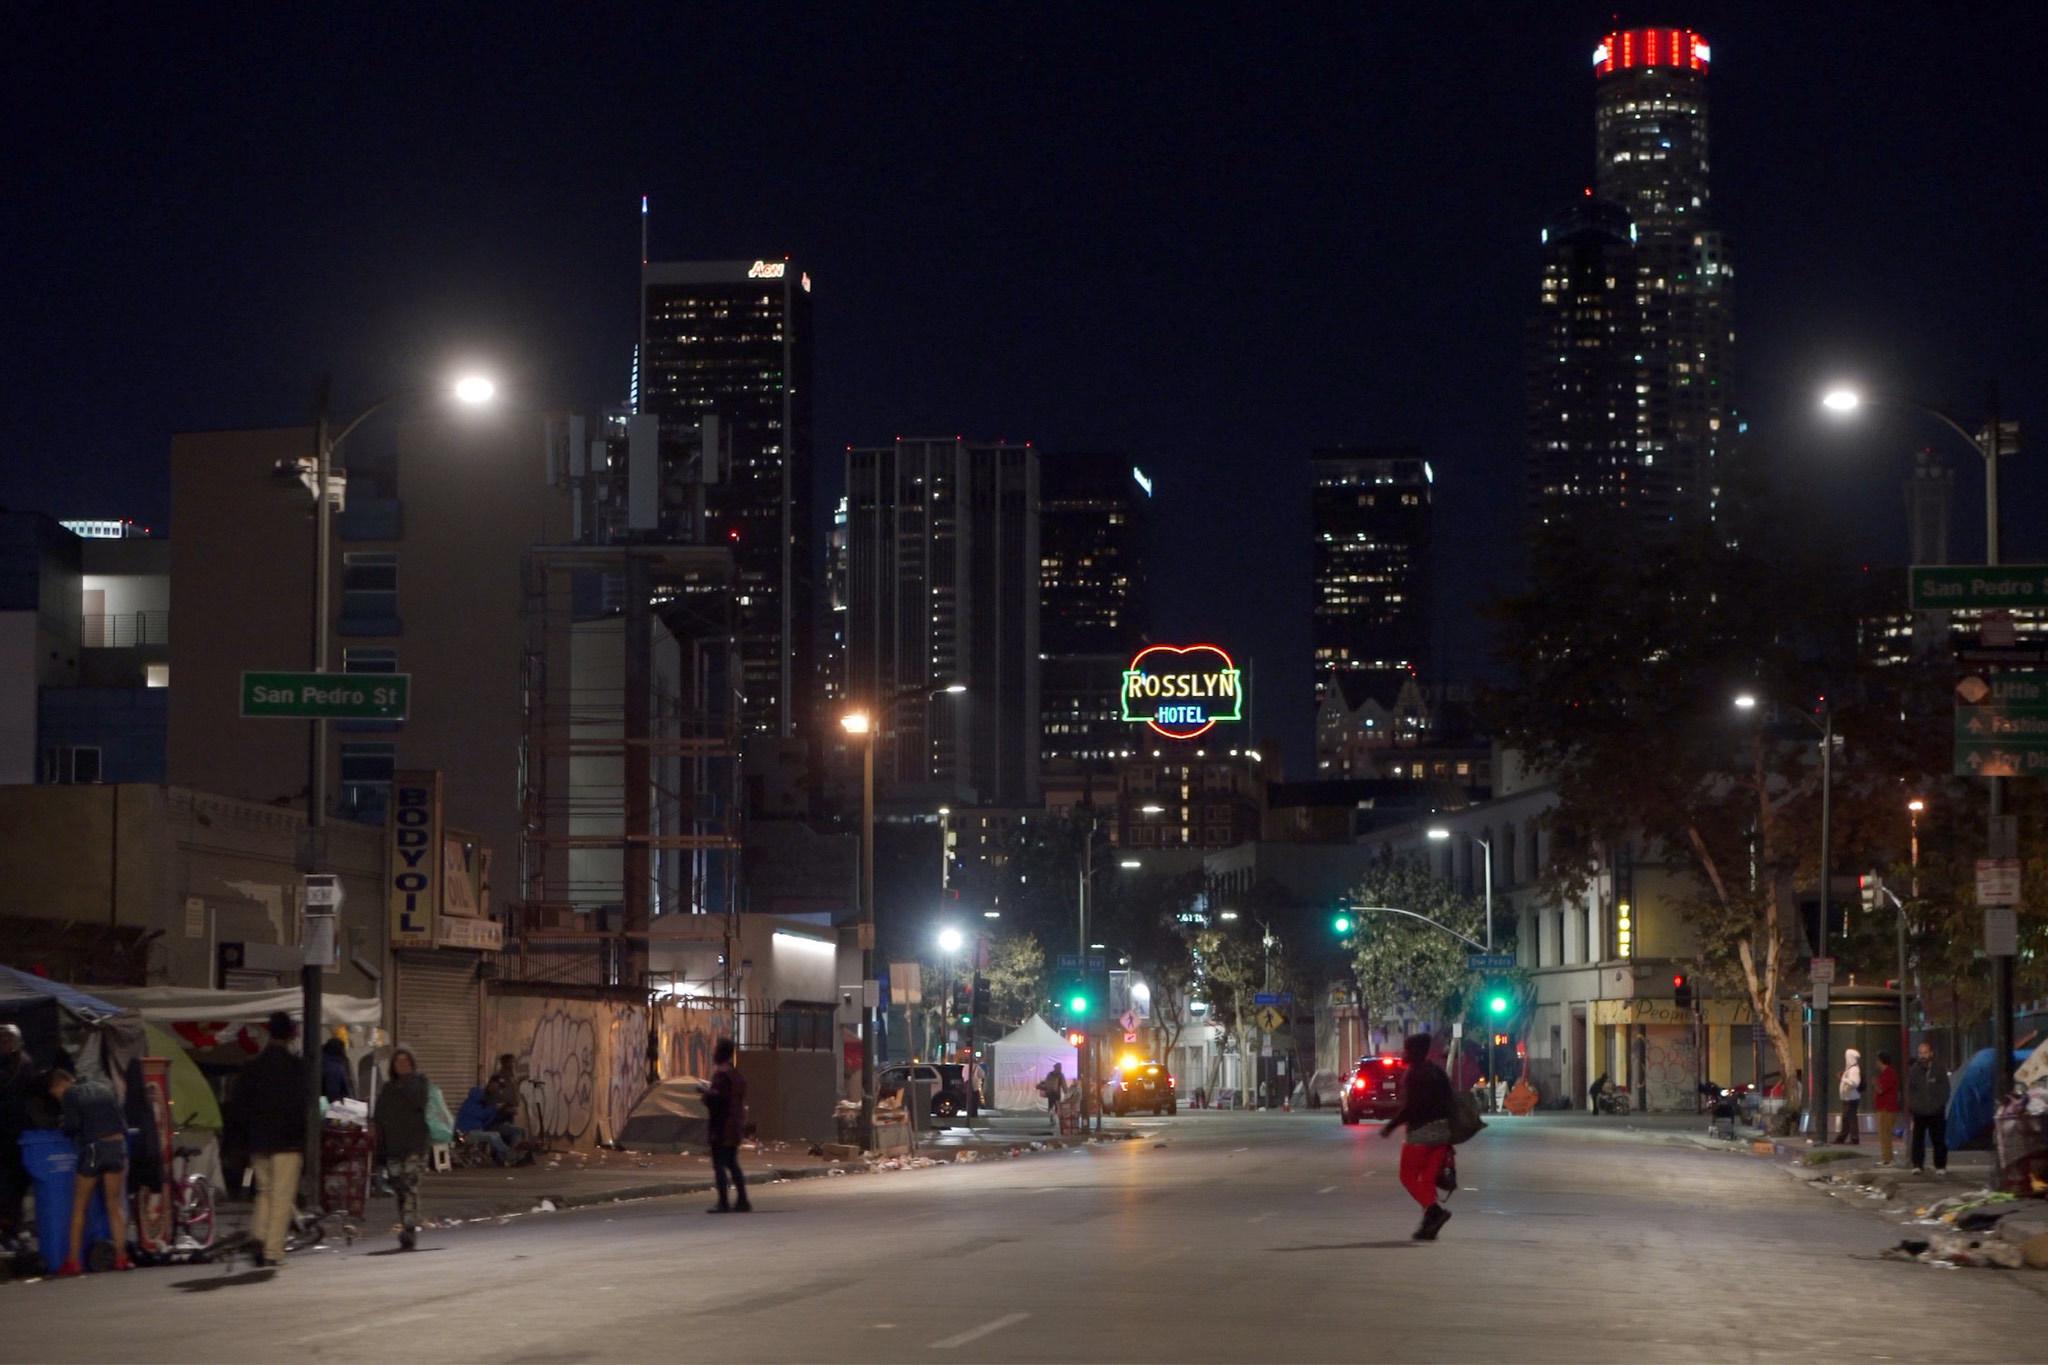 Phenomenon Blade Runner - Los Angeles Street Scene